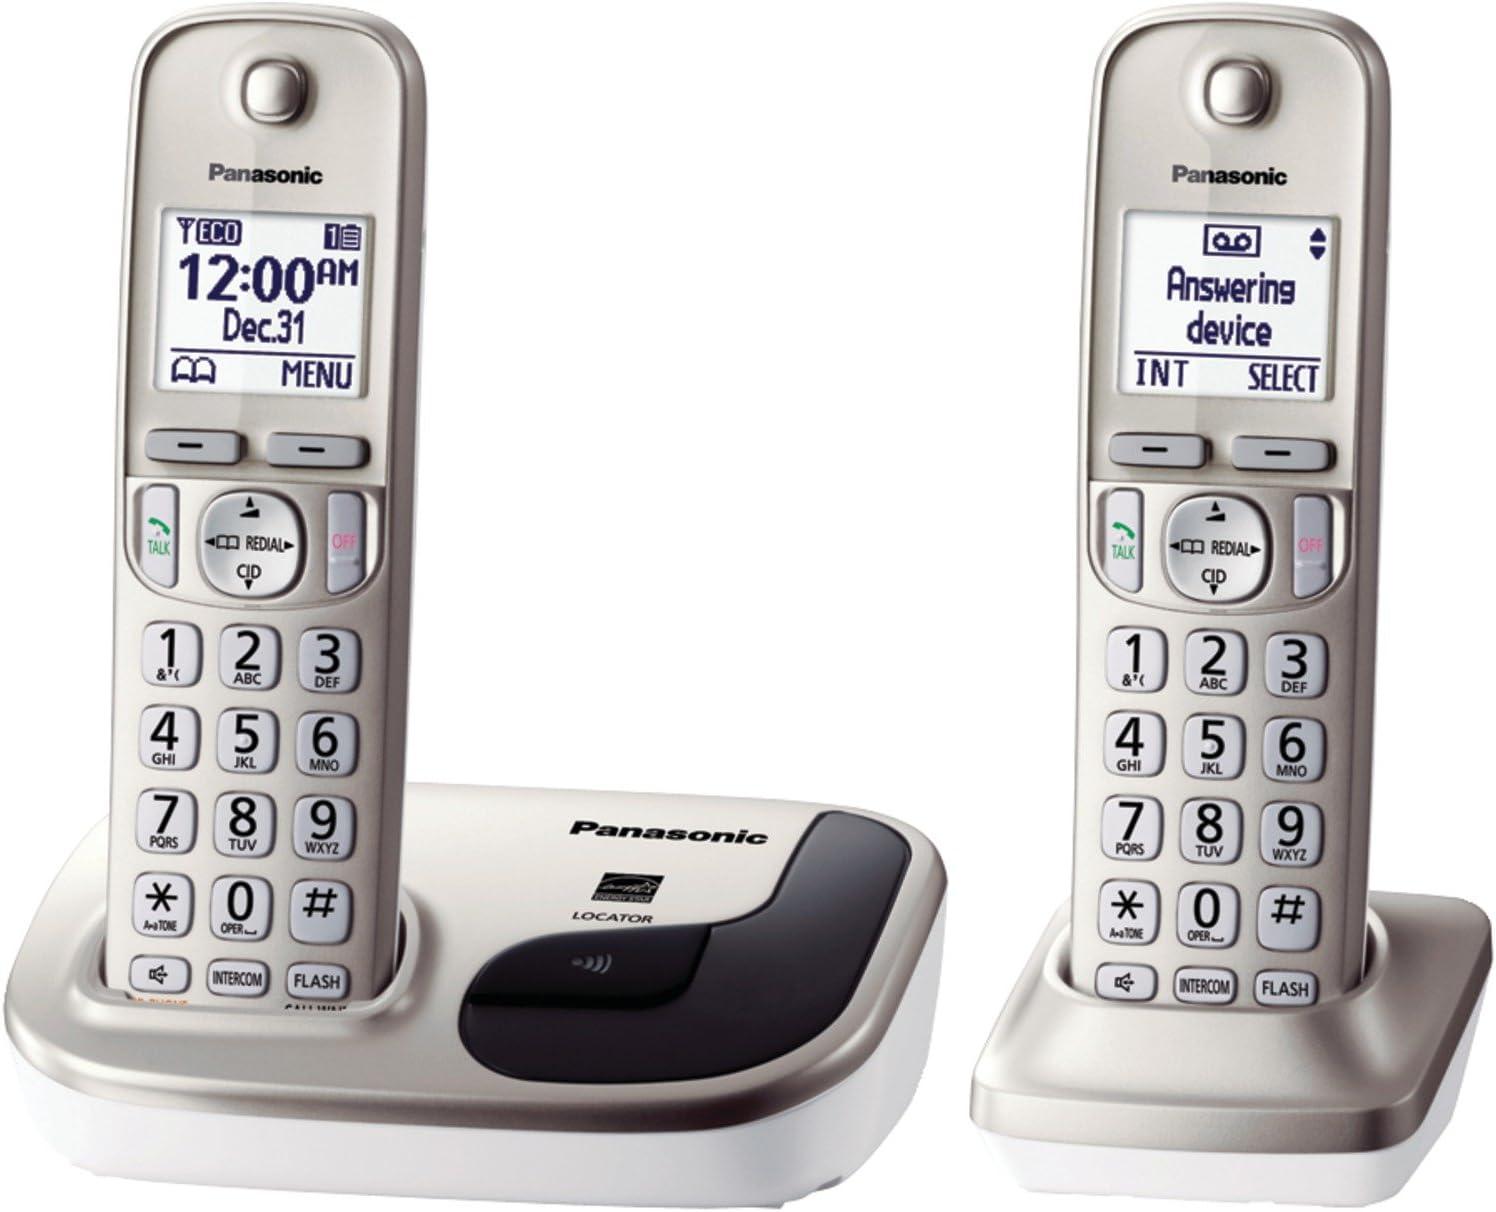 NEW Panasonic KX-TGD210N Expandable Digital Single Cordless Phone FREE GIFT LOOK